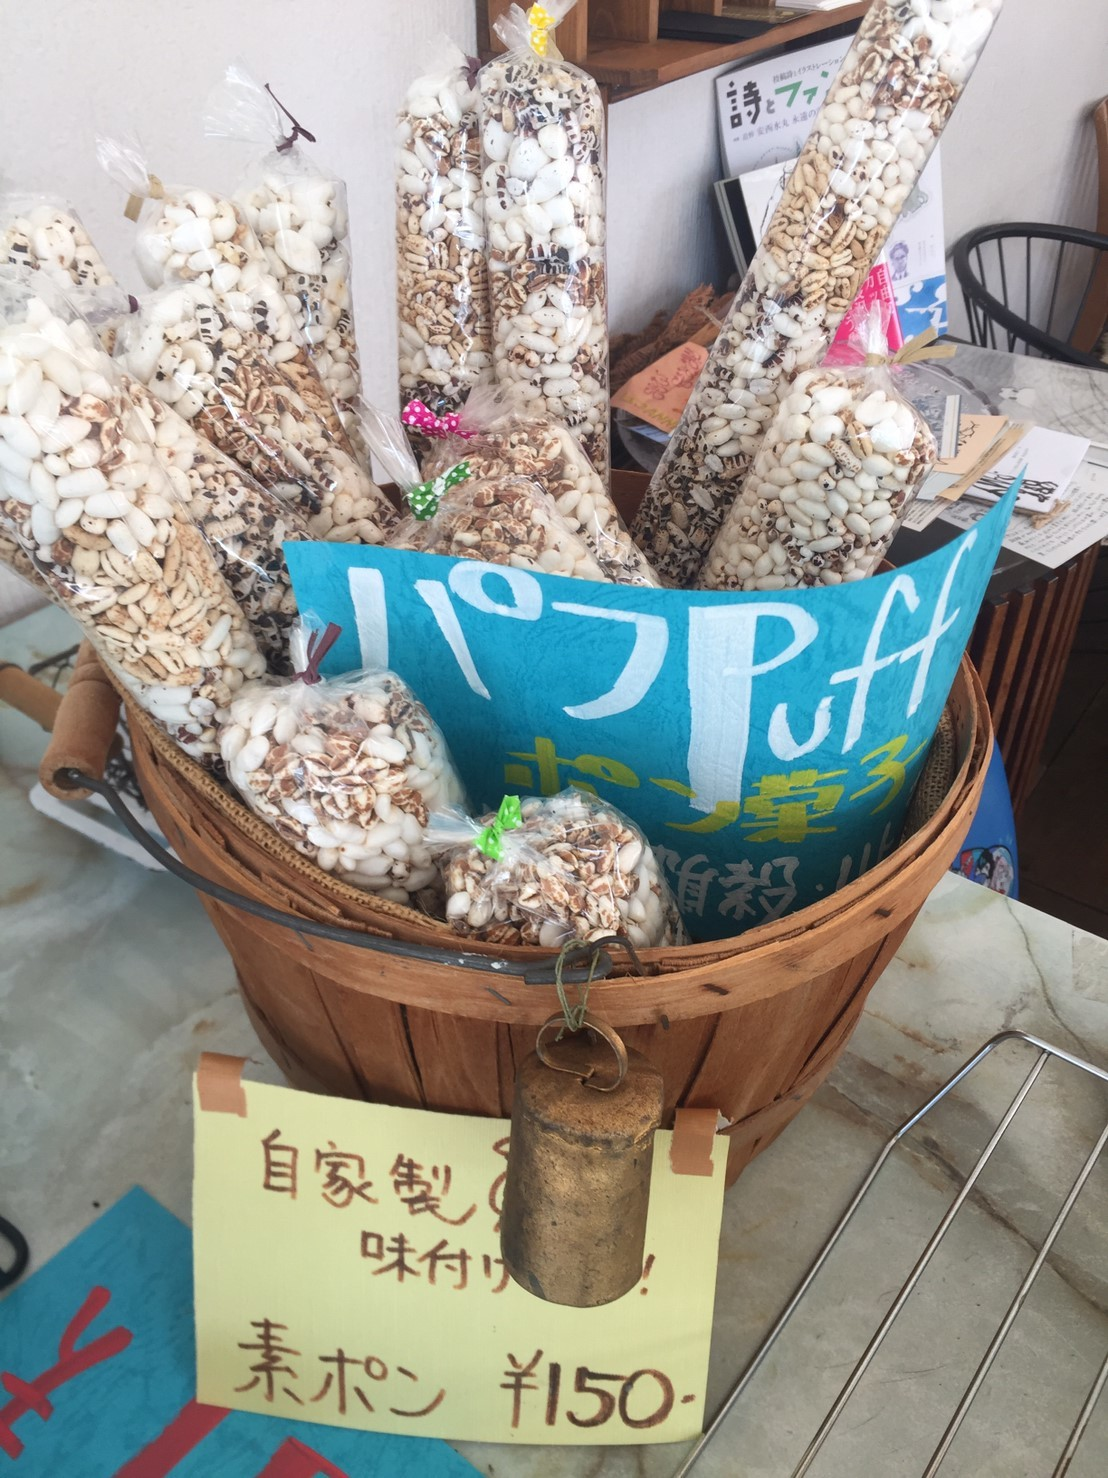 Tottori カルマ  カルマ焼飯_e0115904_22095621.jpg